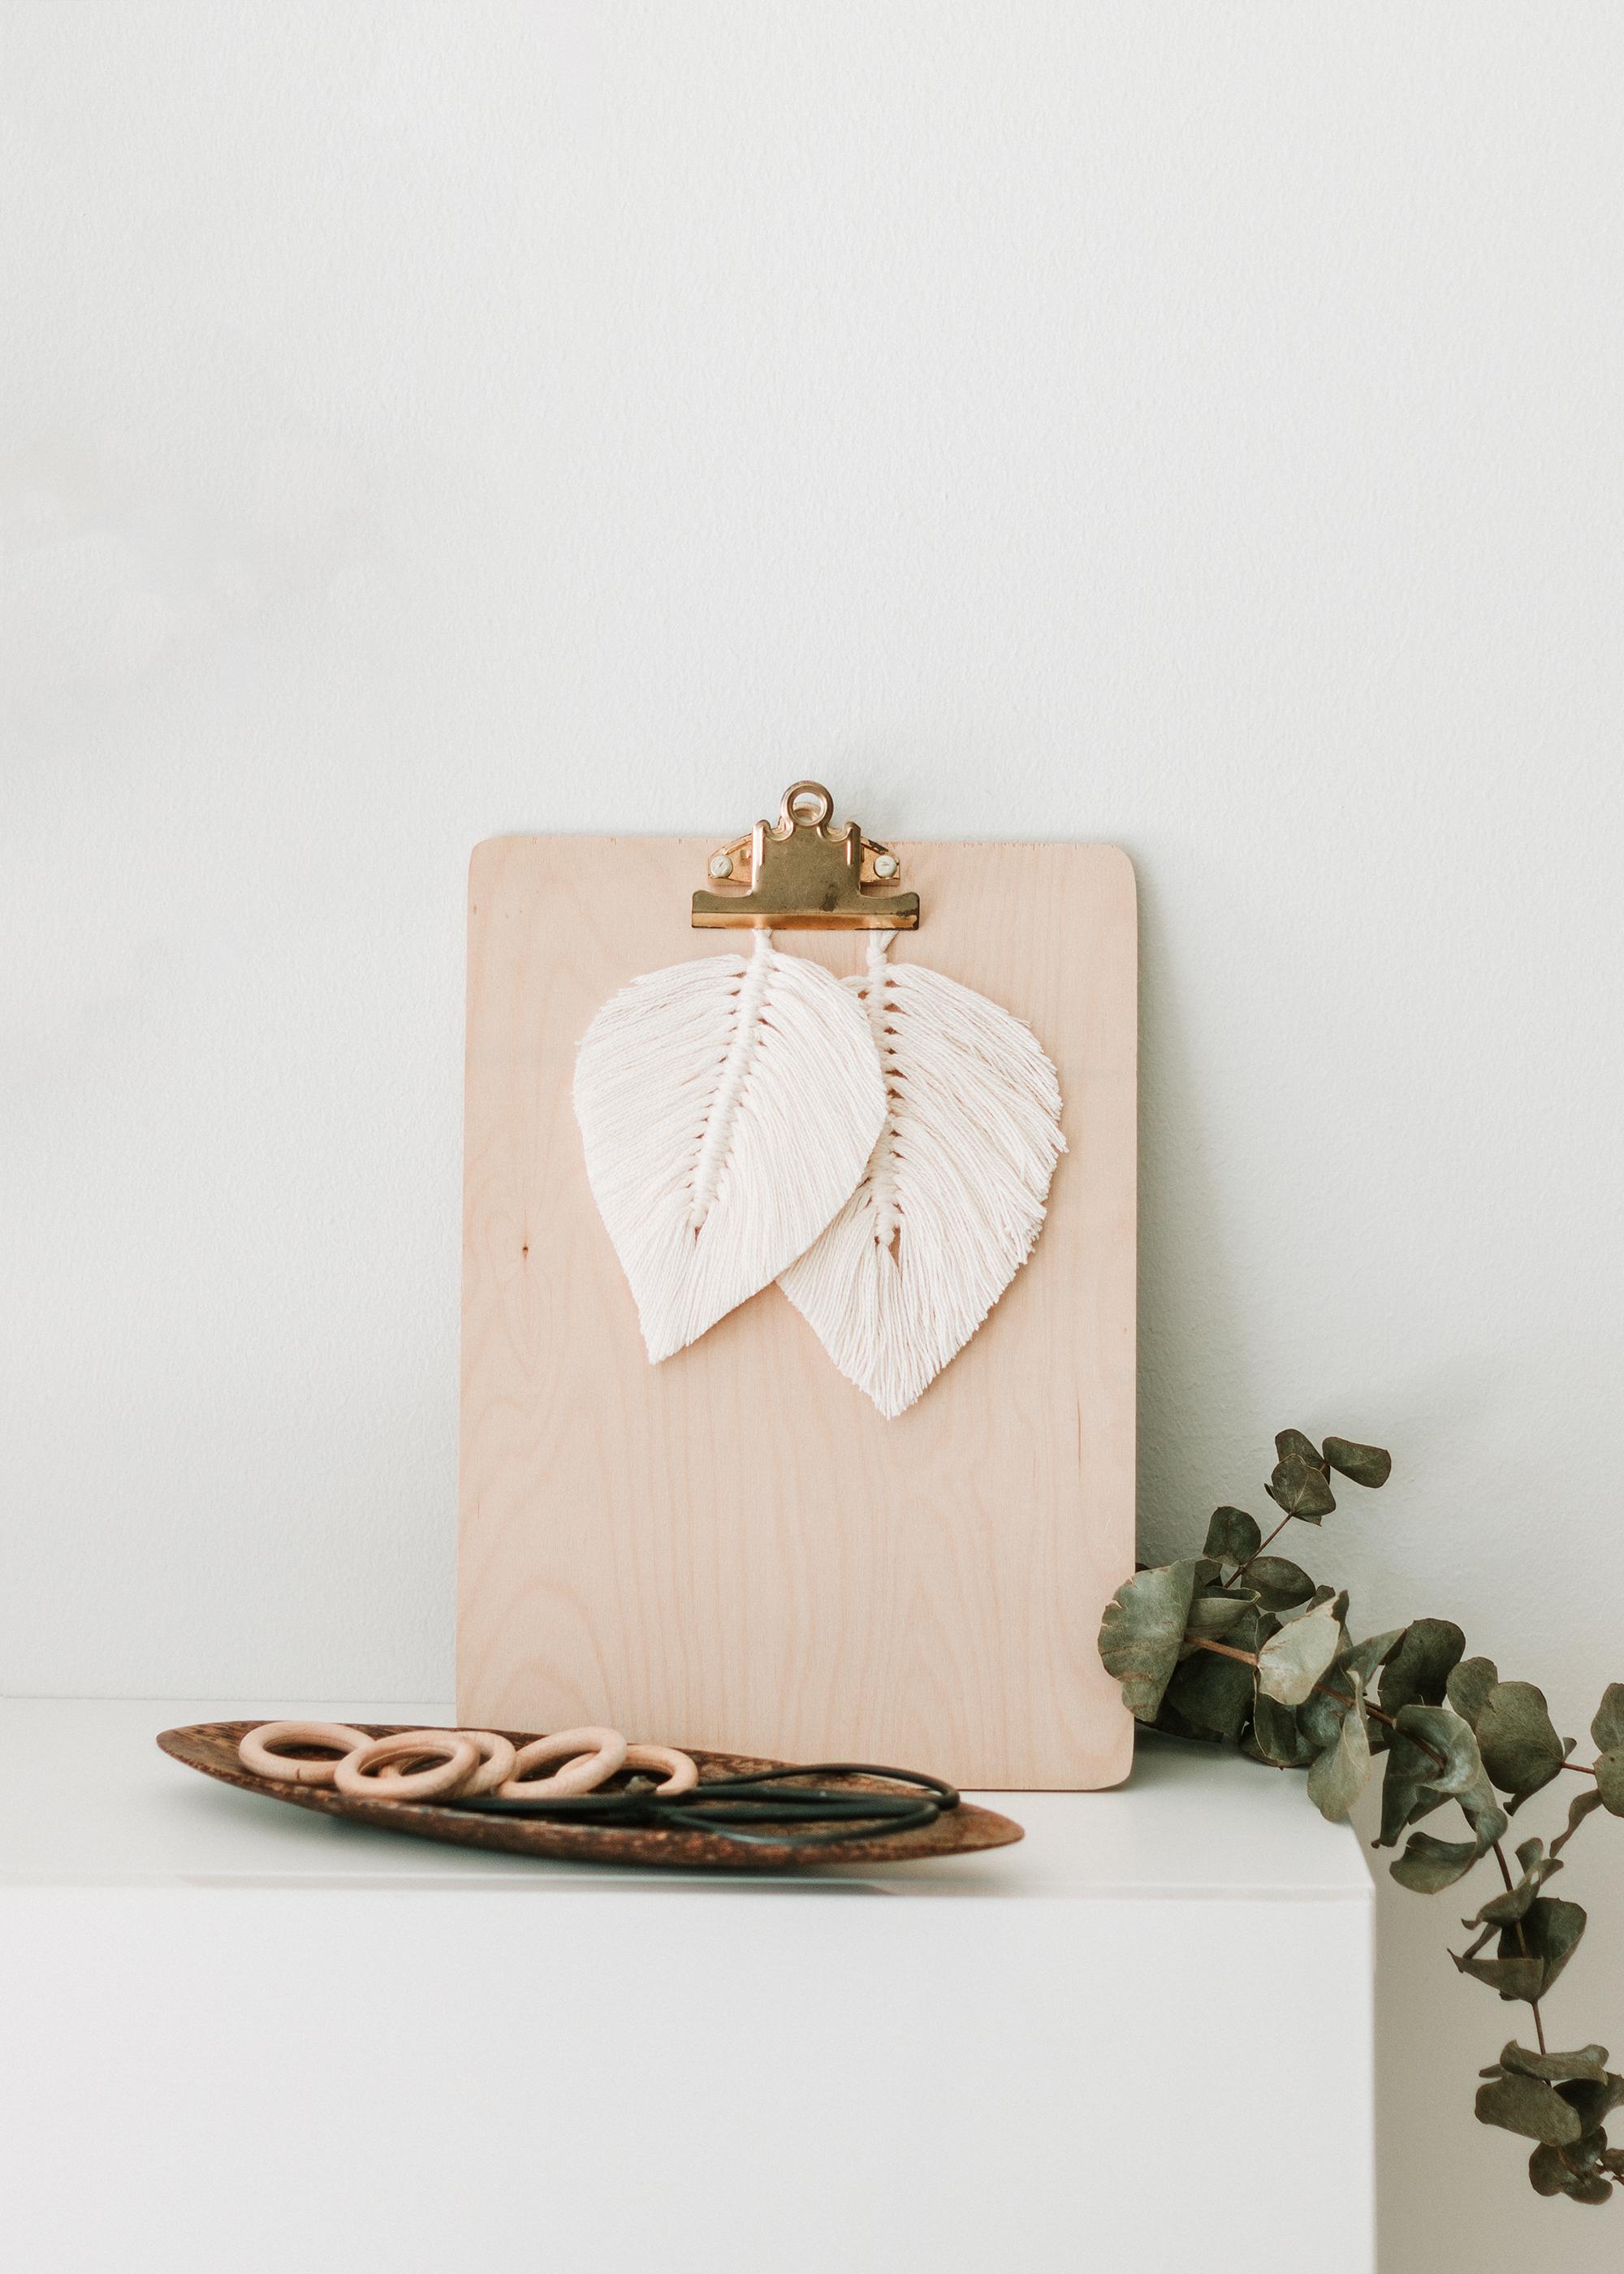 Hur man gör en makraméfjäder | DIY Macramé feather | By Sandramaria | Sandramarias.com